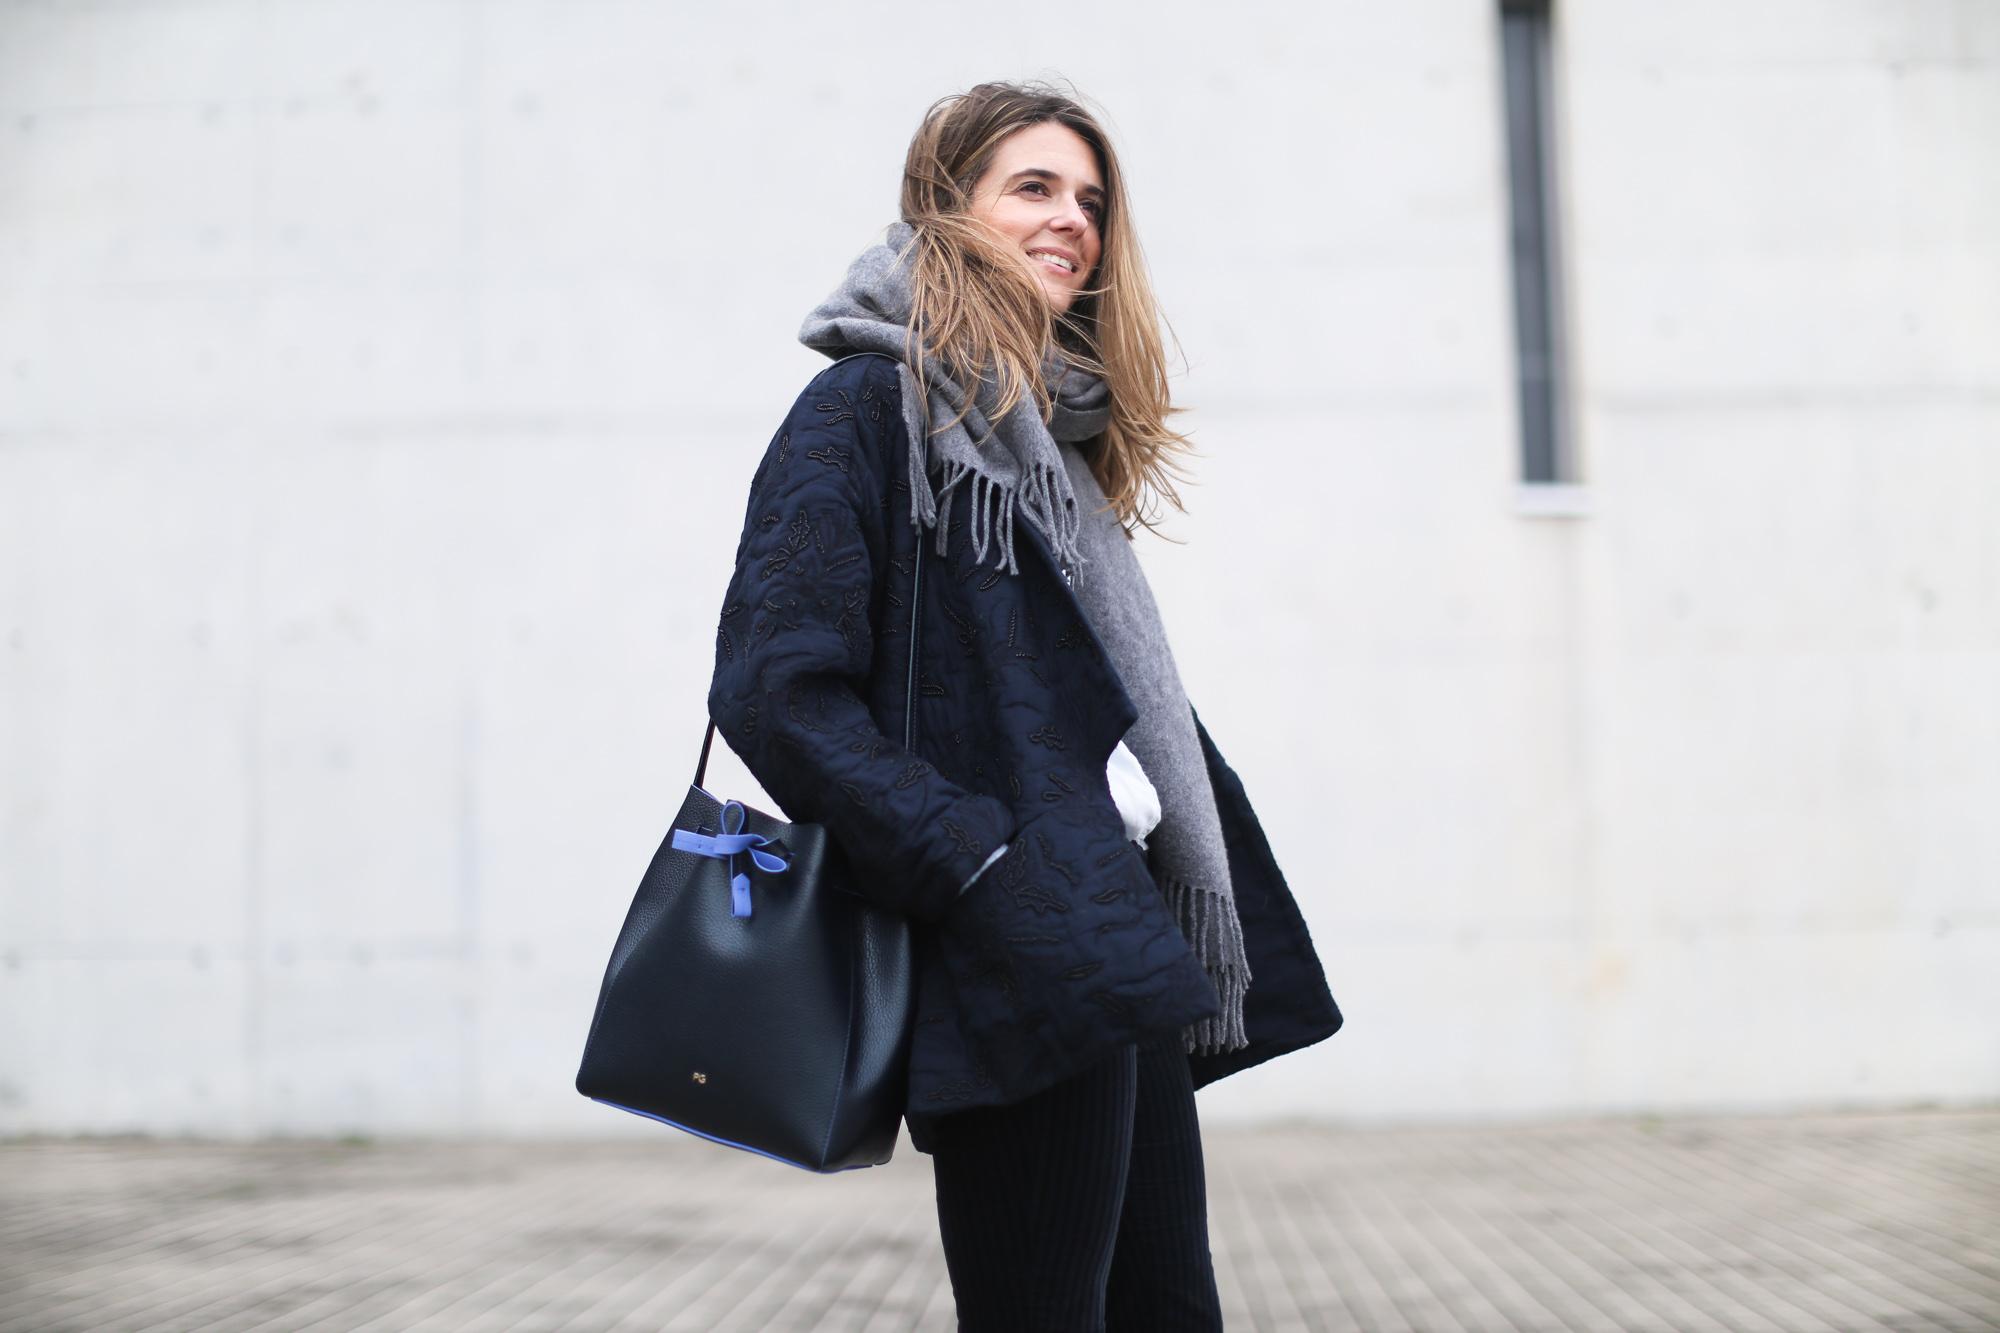 clochet_streetstyle_embroided_kimono_jacket_purificacion_garcia_bucket_bag-6